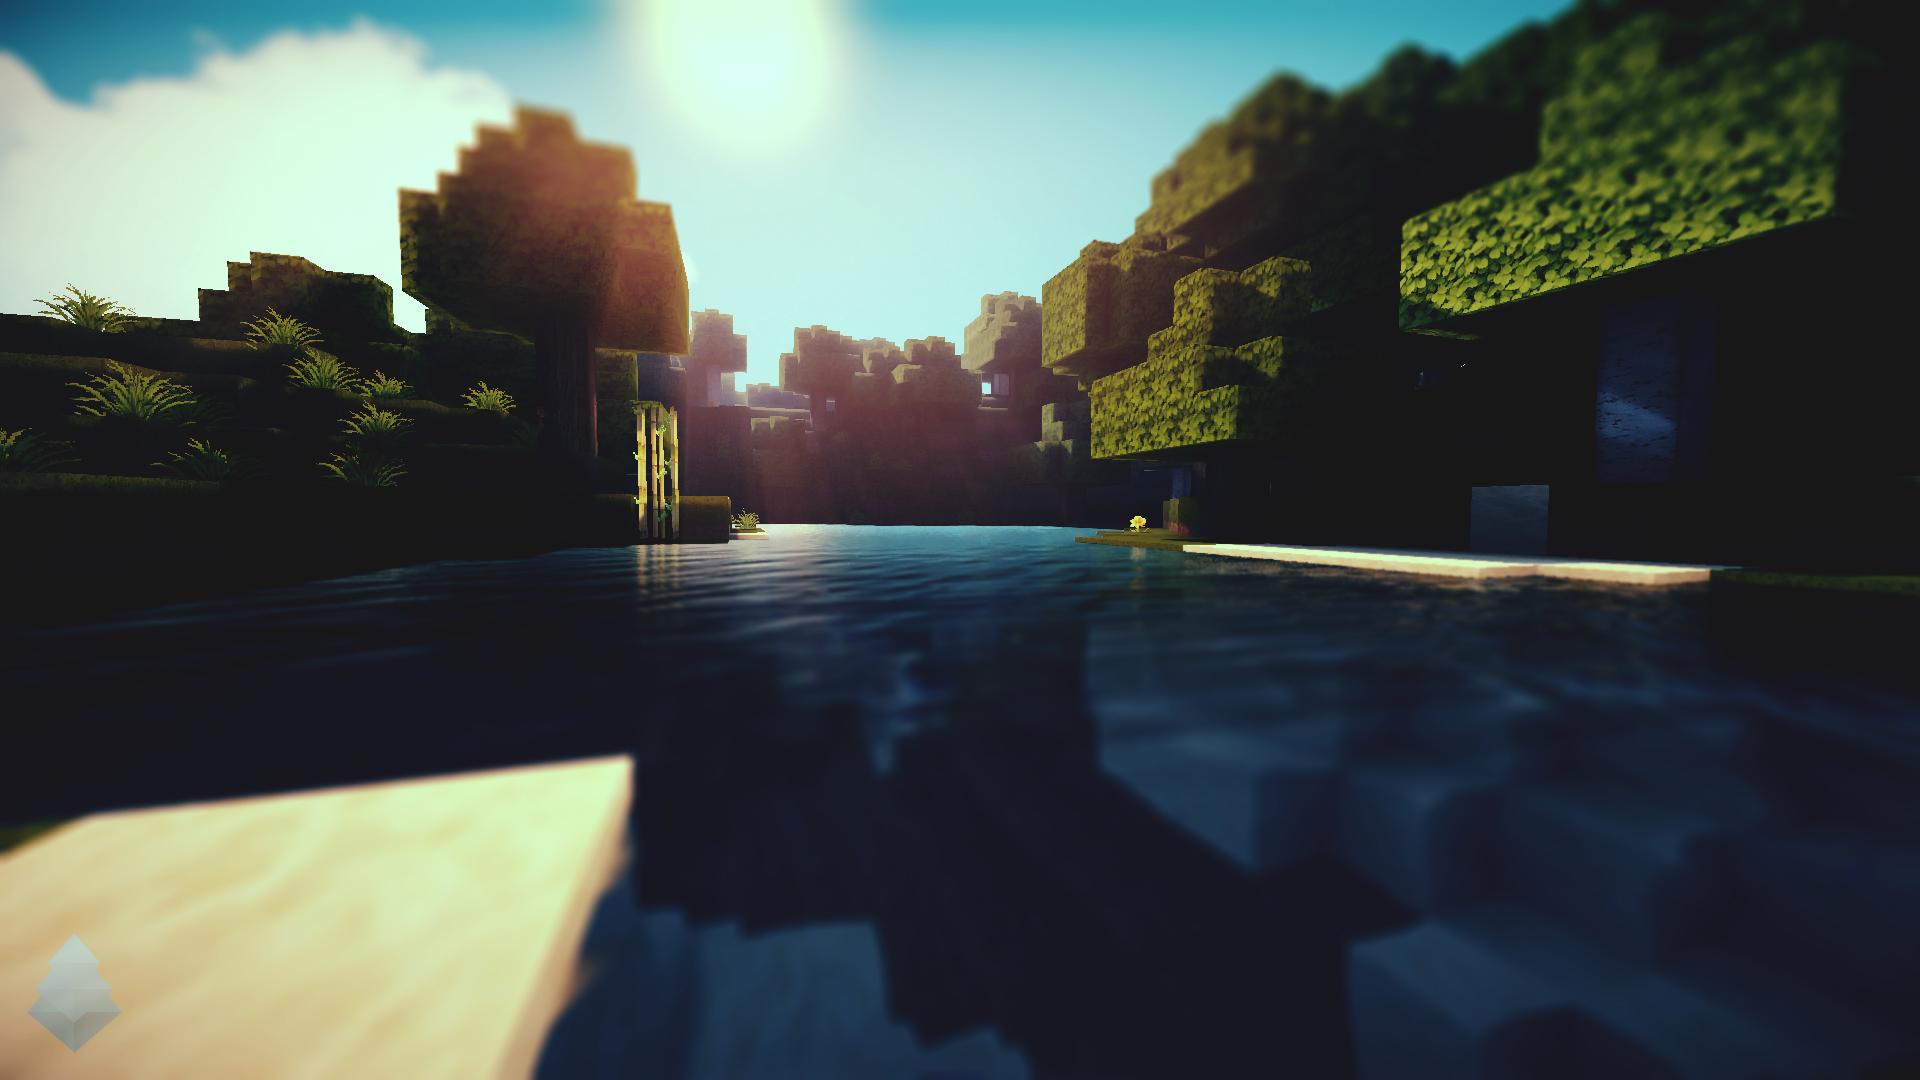 Beautiful Wallpaper Minecraft Night - minecraft_waterlight_wallpaper_by_lpzdesign-d5phz24  Trends_548958.jpg